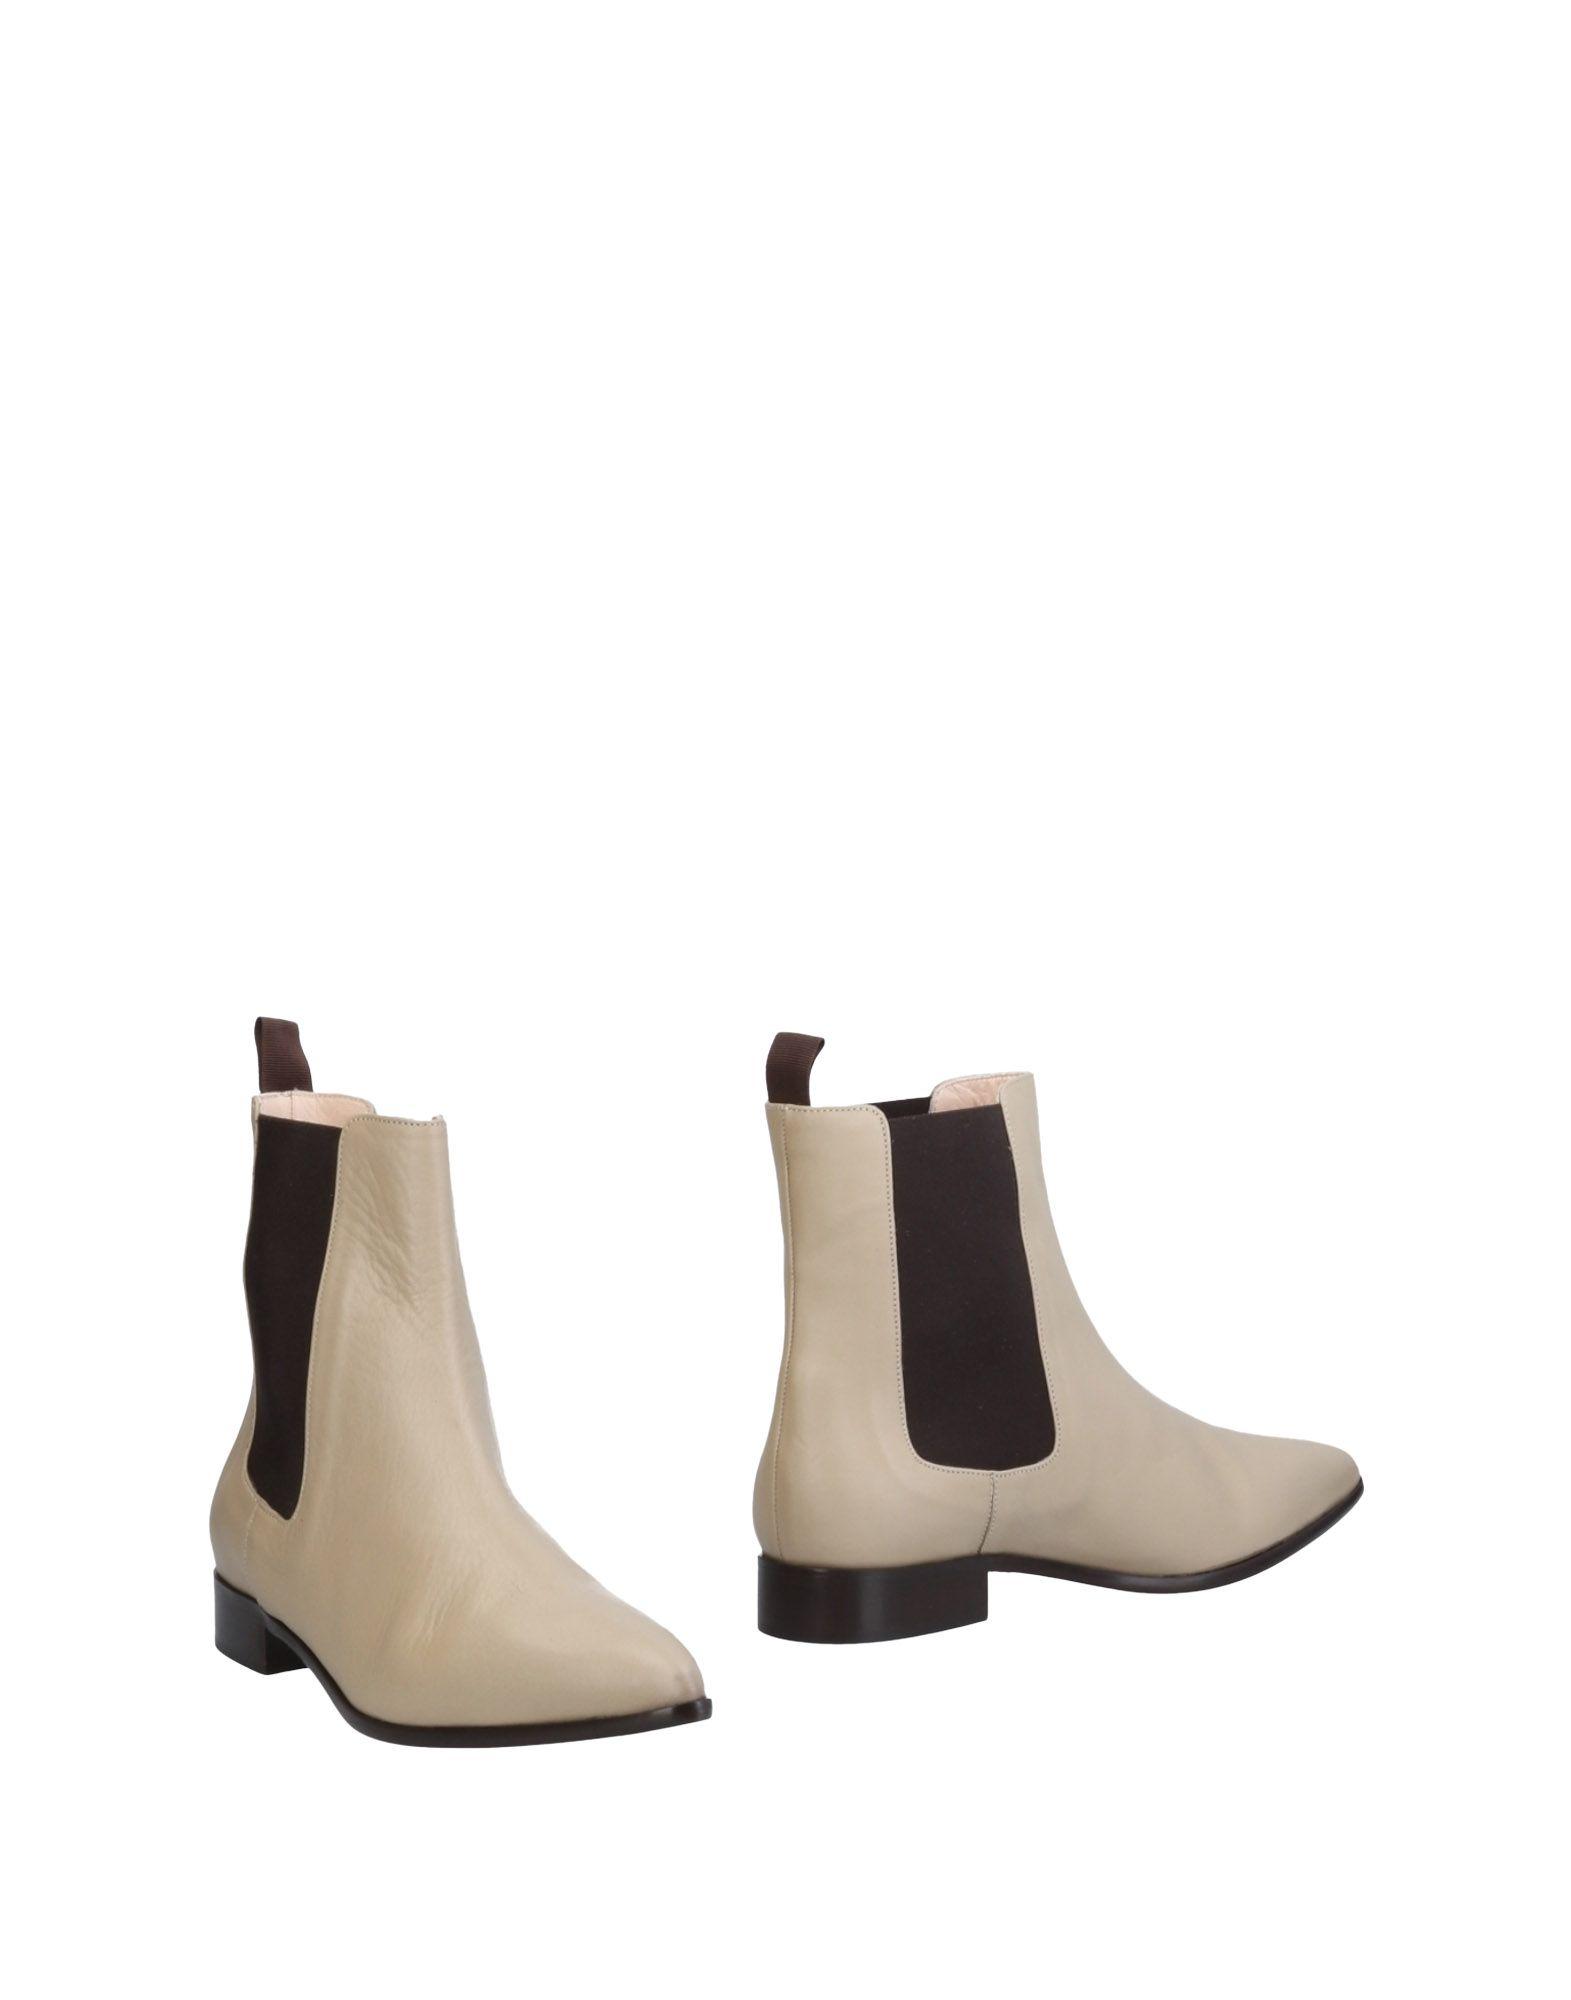 IRIS & INK Ankle Boot in Beige